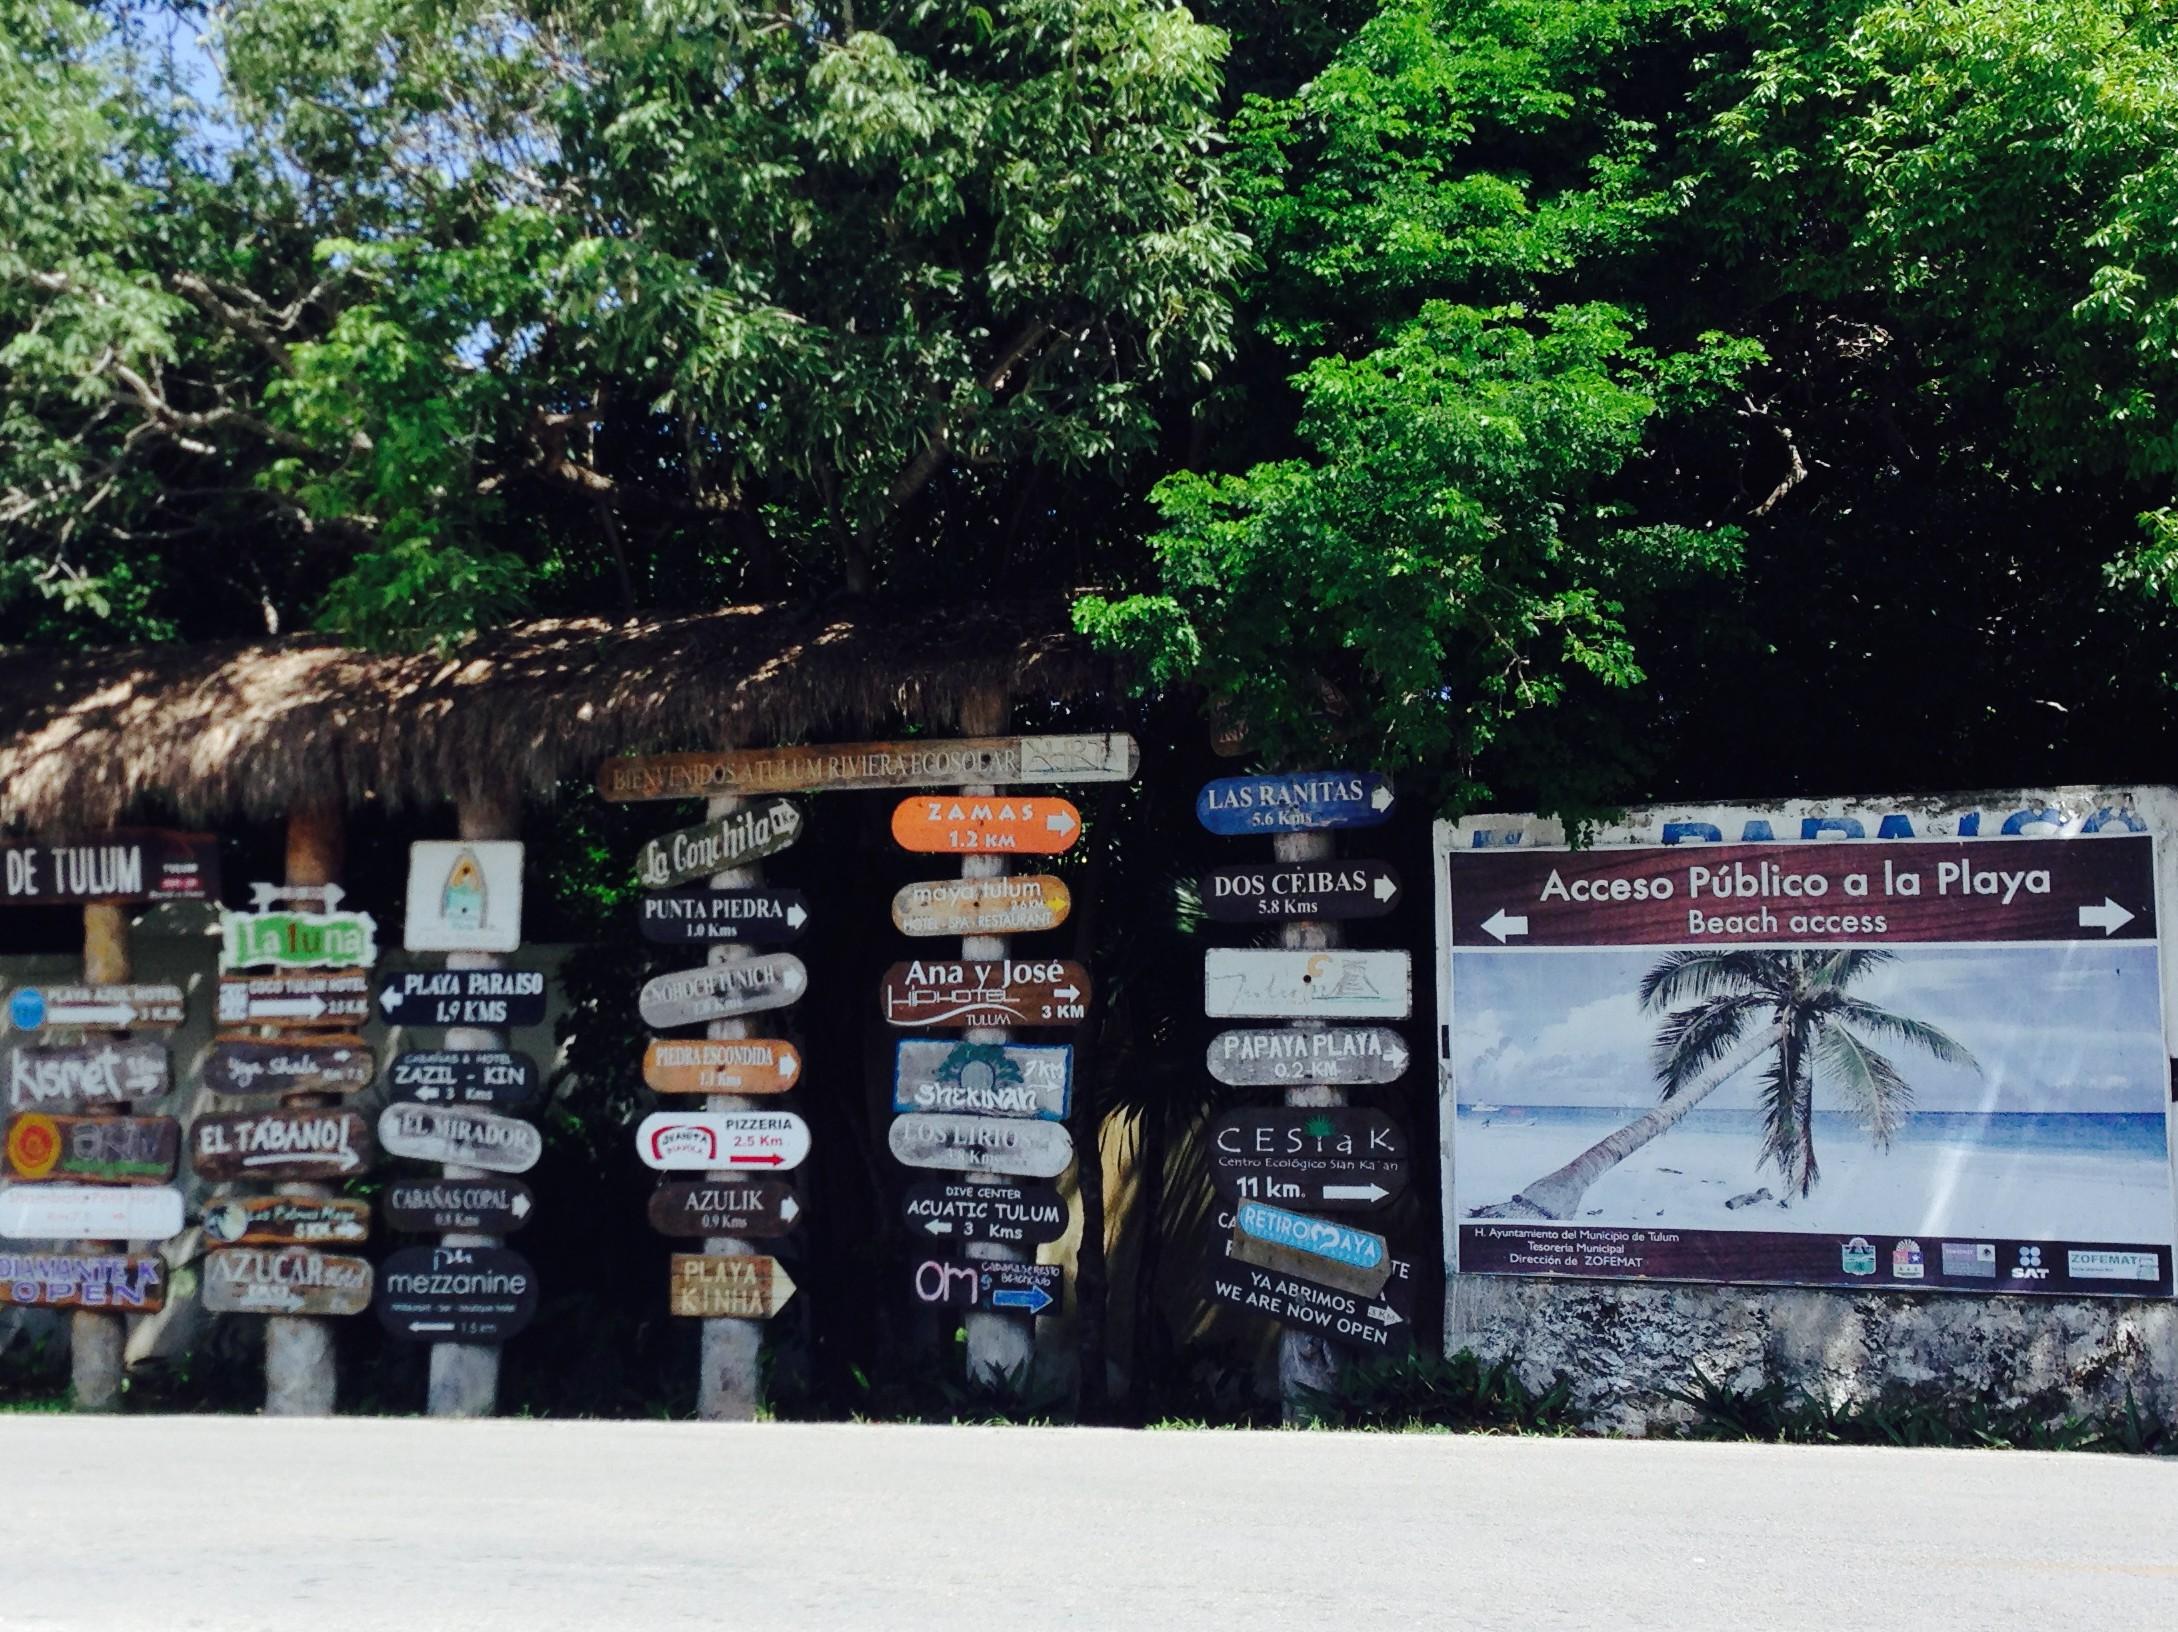 Arriving to the Tulum coastal zone